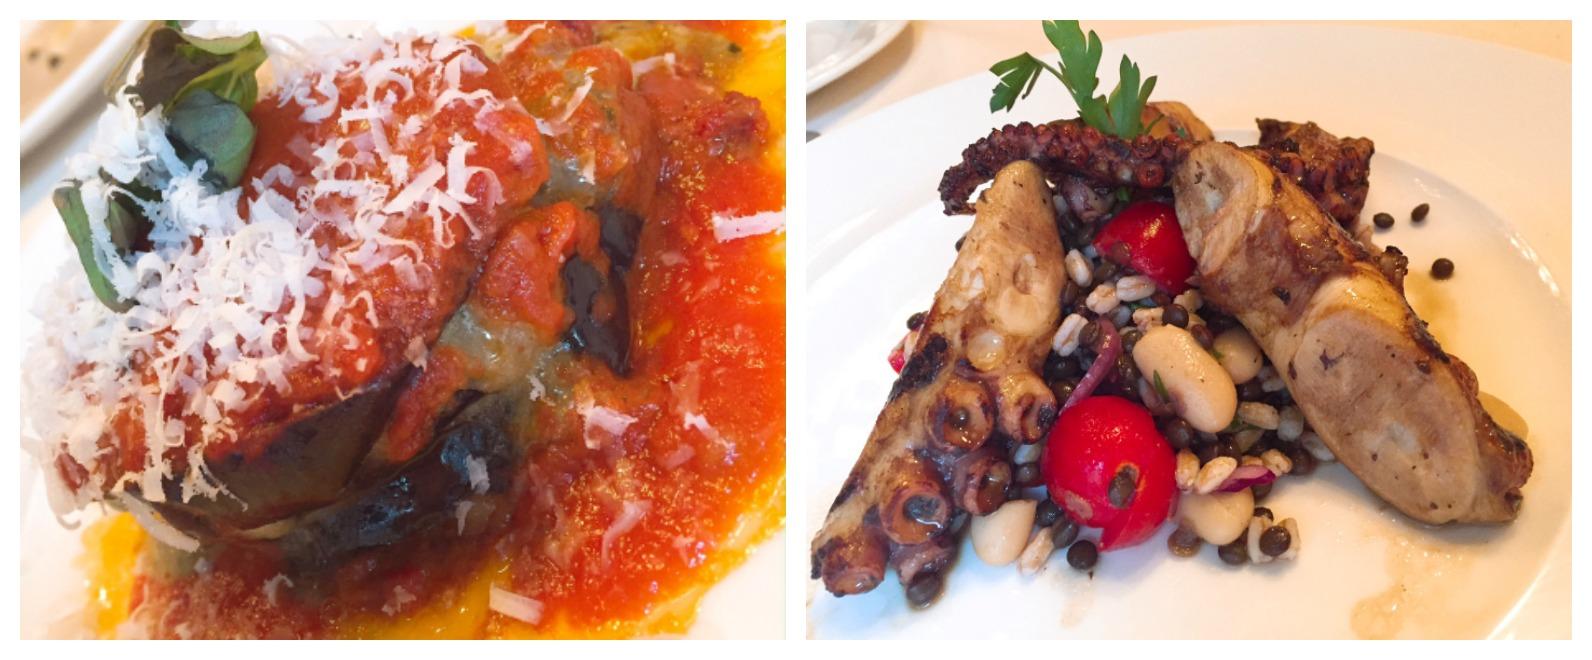 Quattro Miami Beach Eggplant parm and Grilled Octopus Appetizer